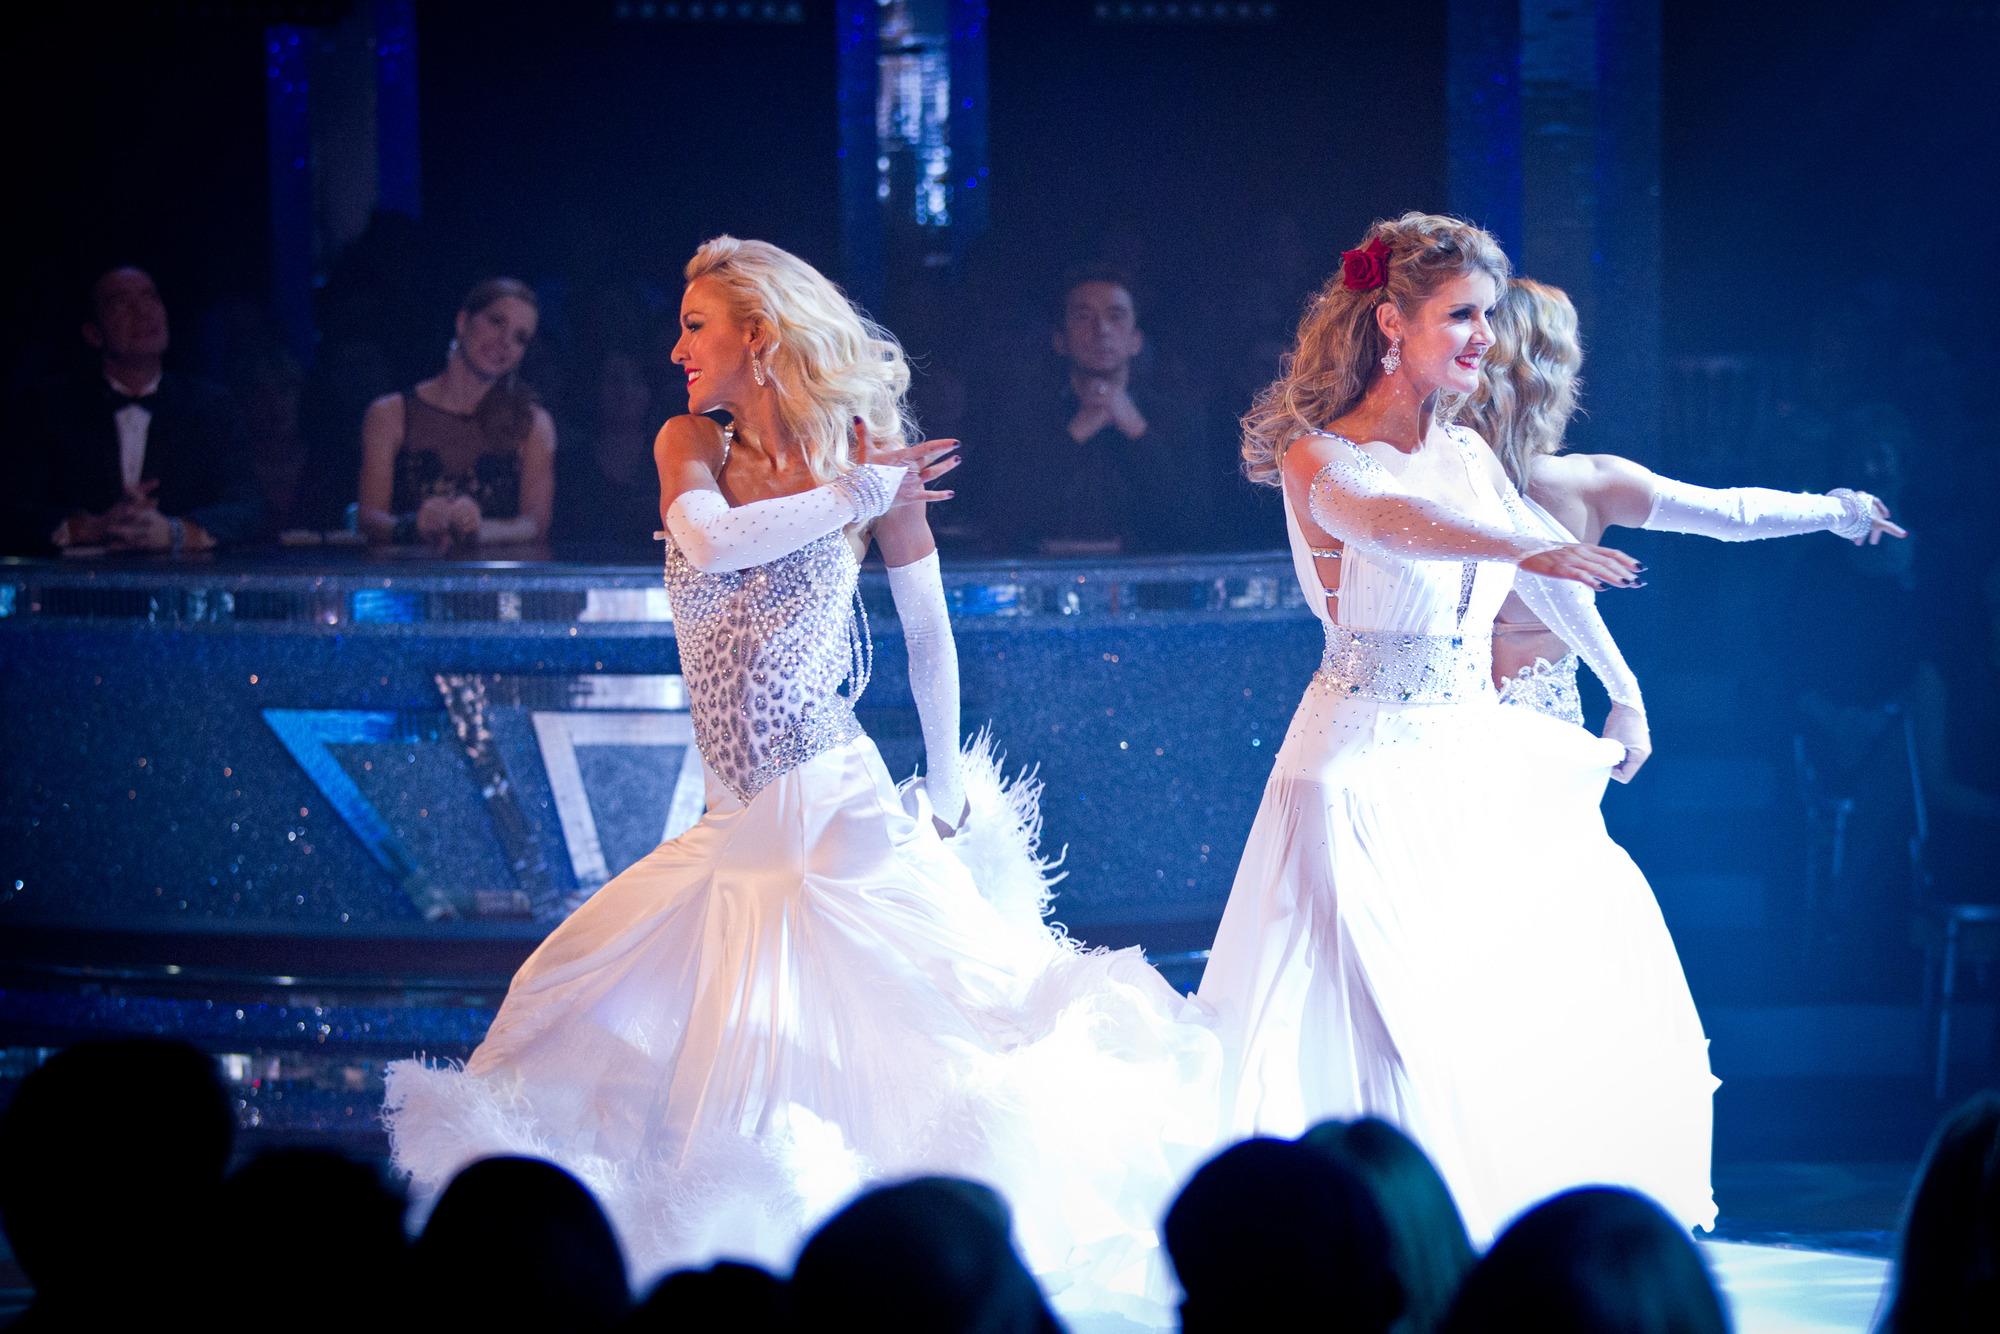 The Strictly professional dancers Natalie Lowe, Erin Boag, Ola Jordan - (C) BBC - Photographer: Guy Levy